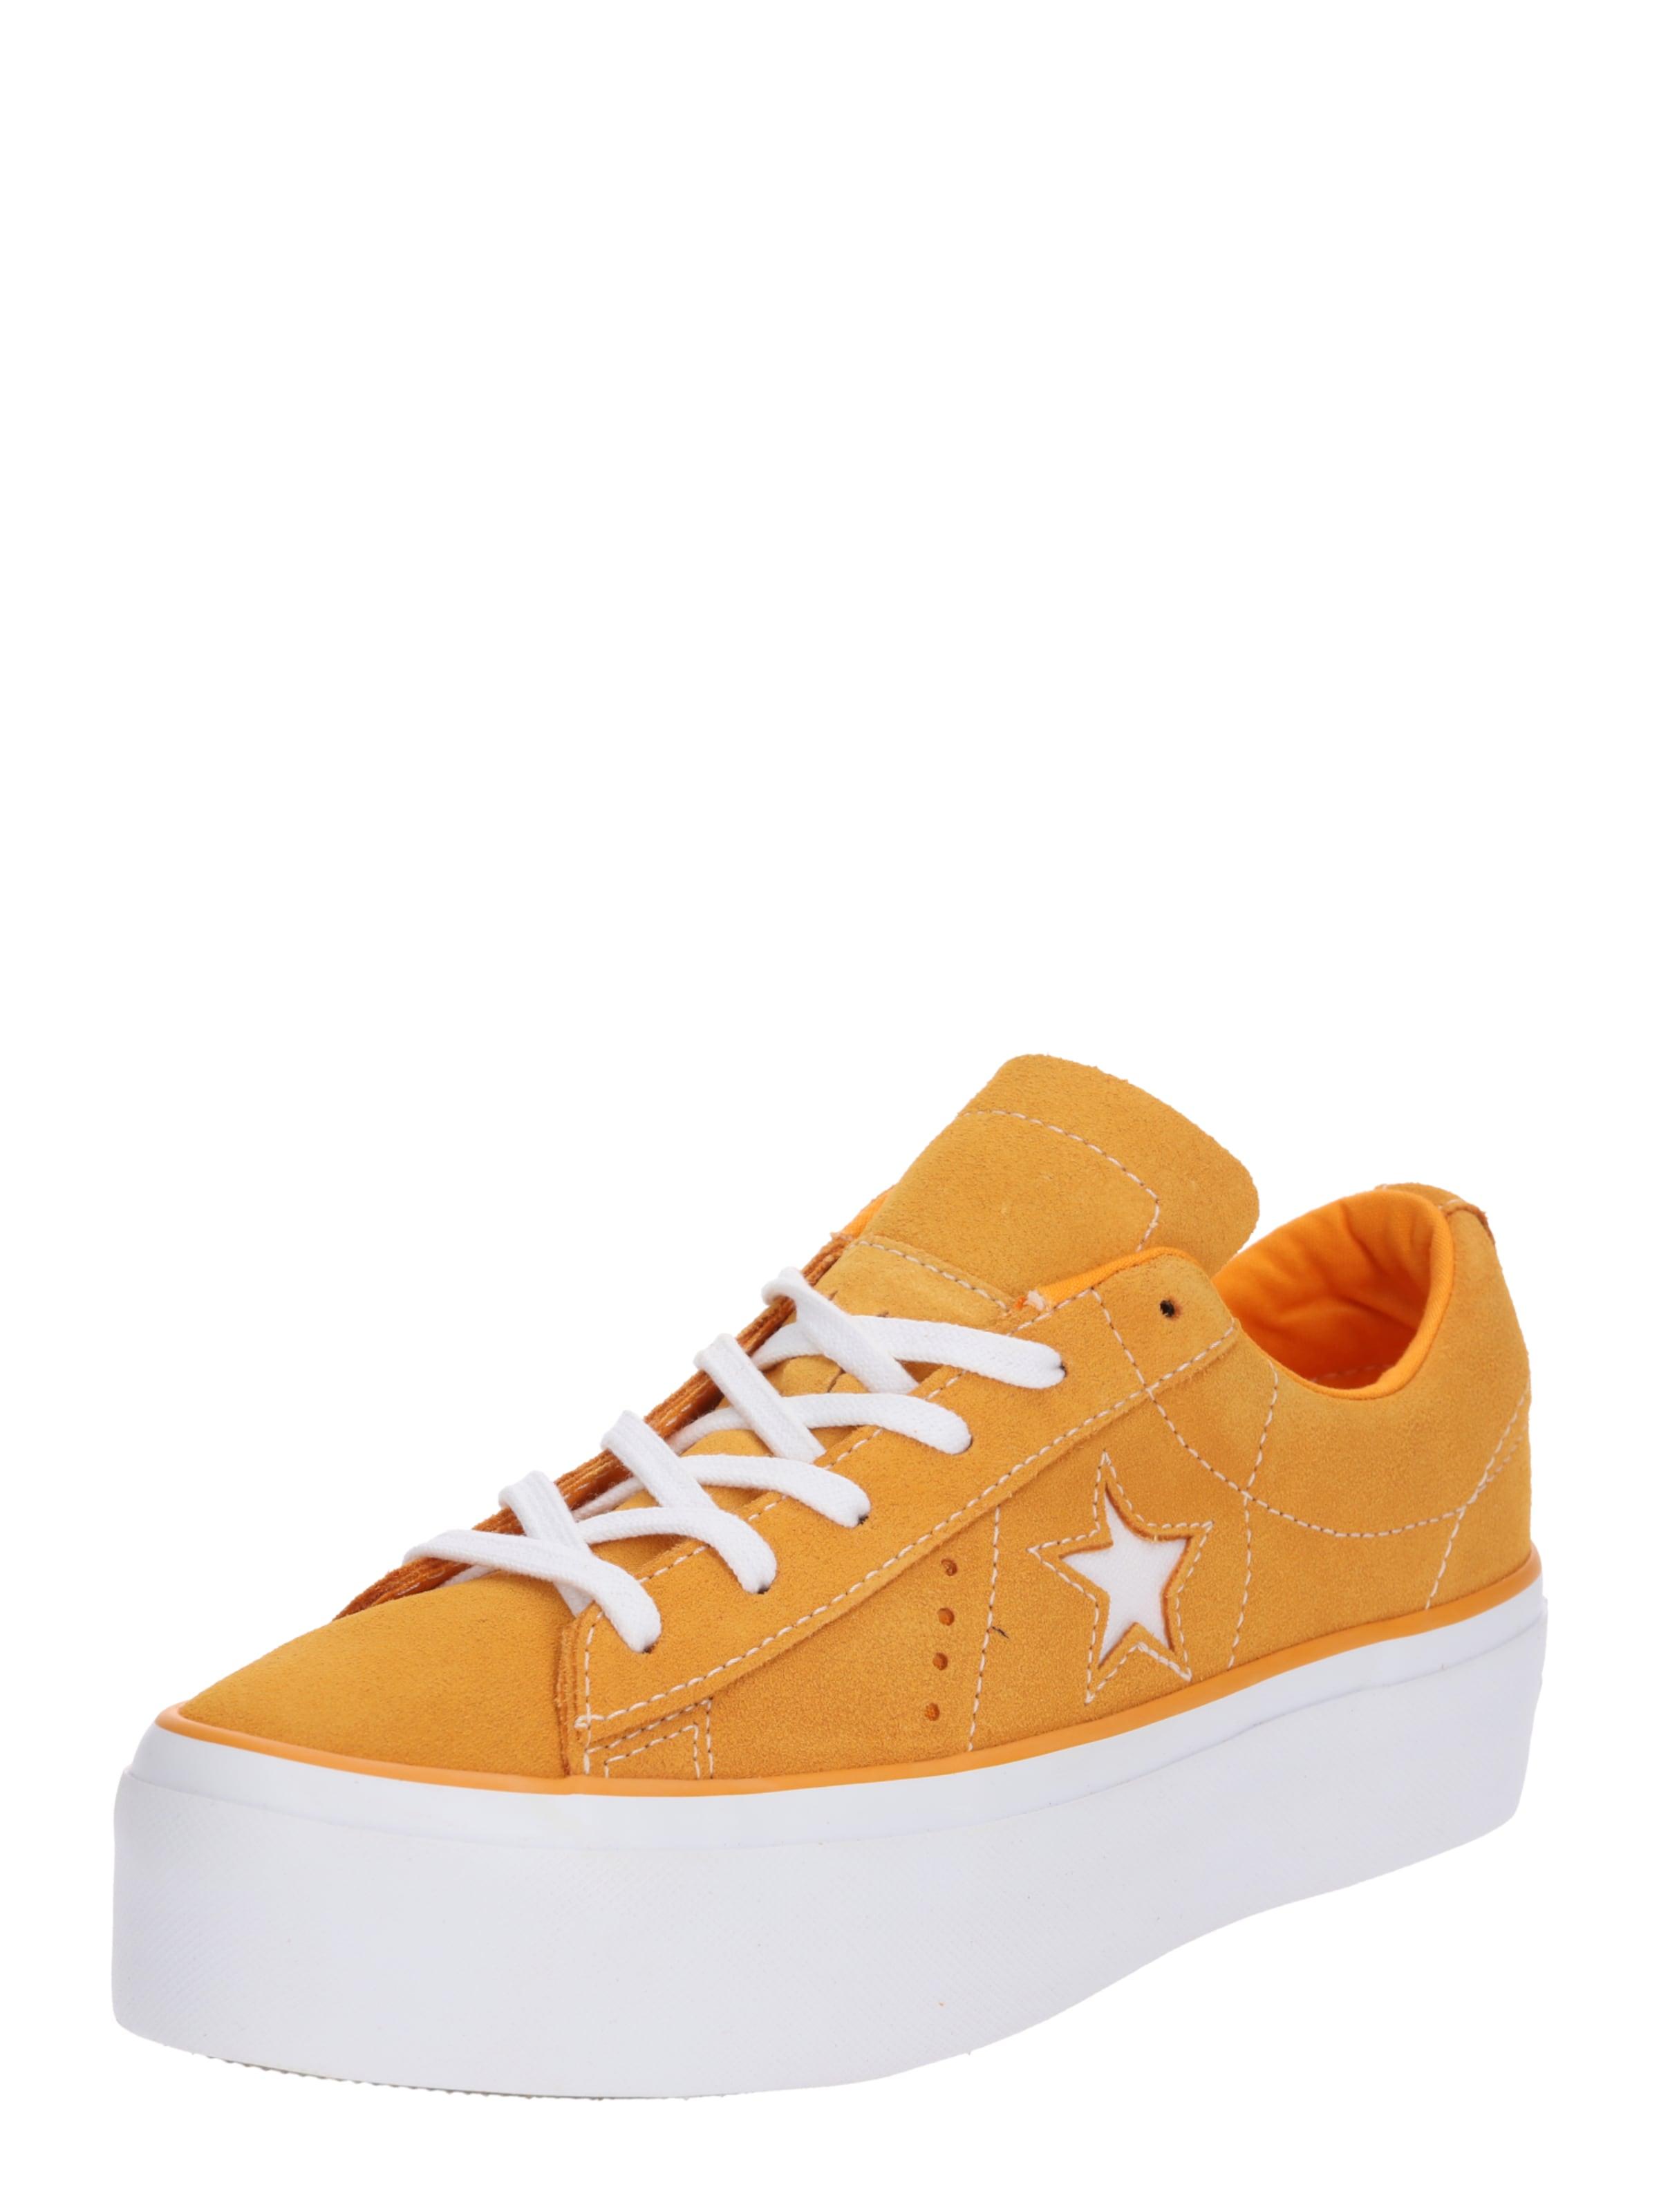 Converse Baskets PlatformOx' 'one En Star OrangeBlanc Basses WbD9HeEYI2